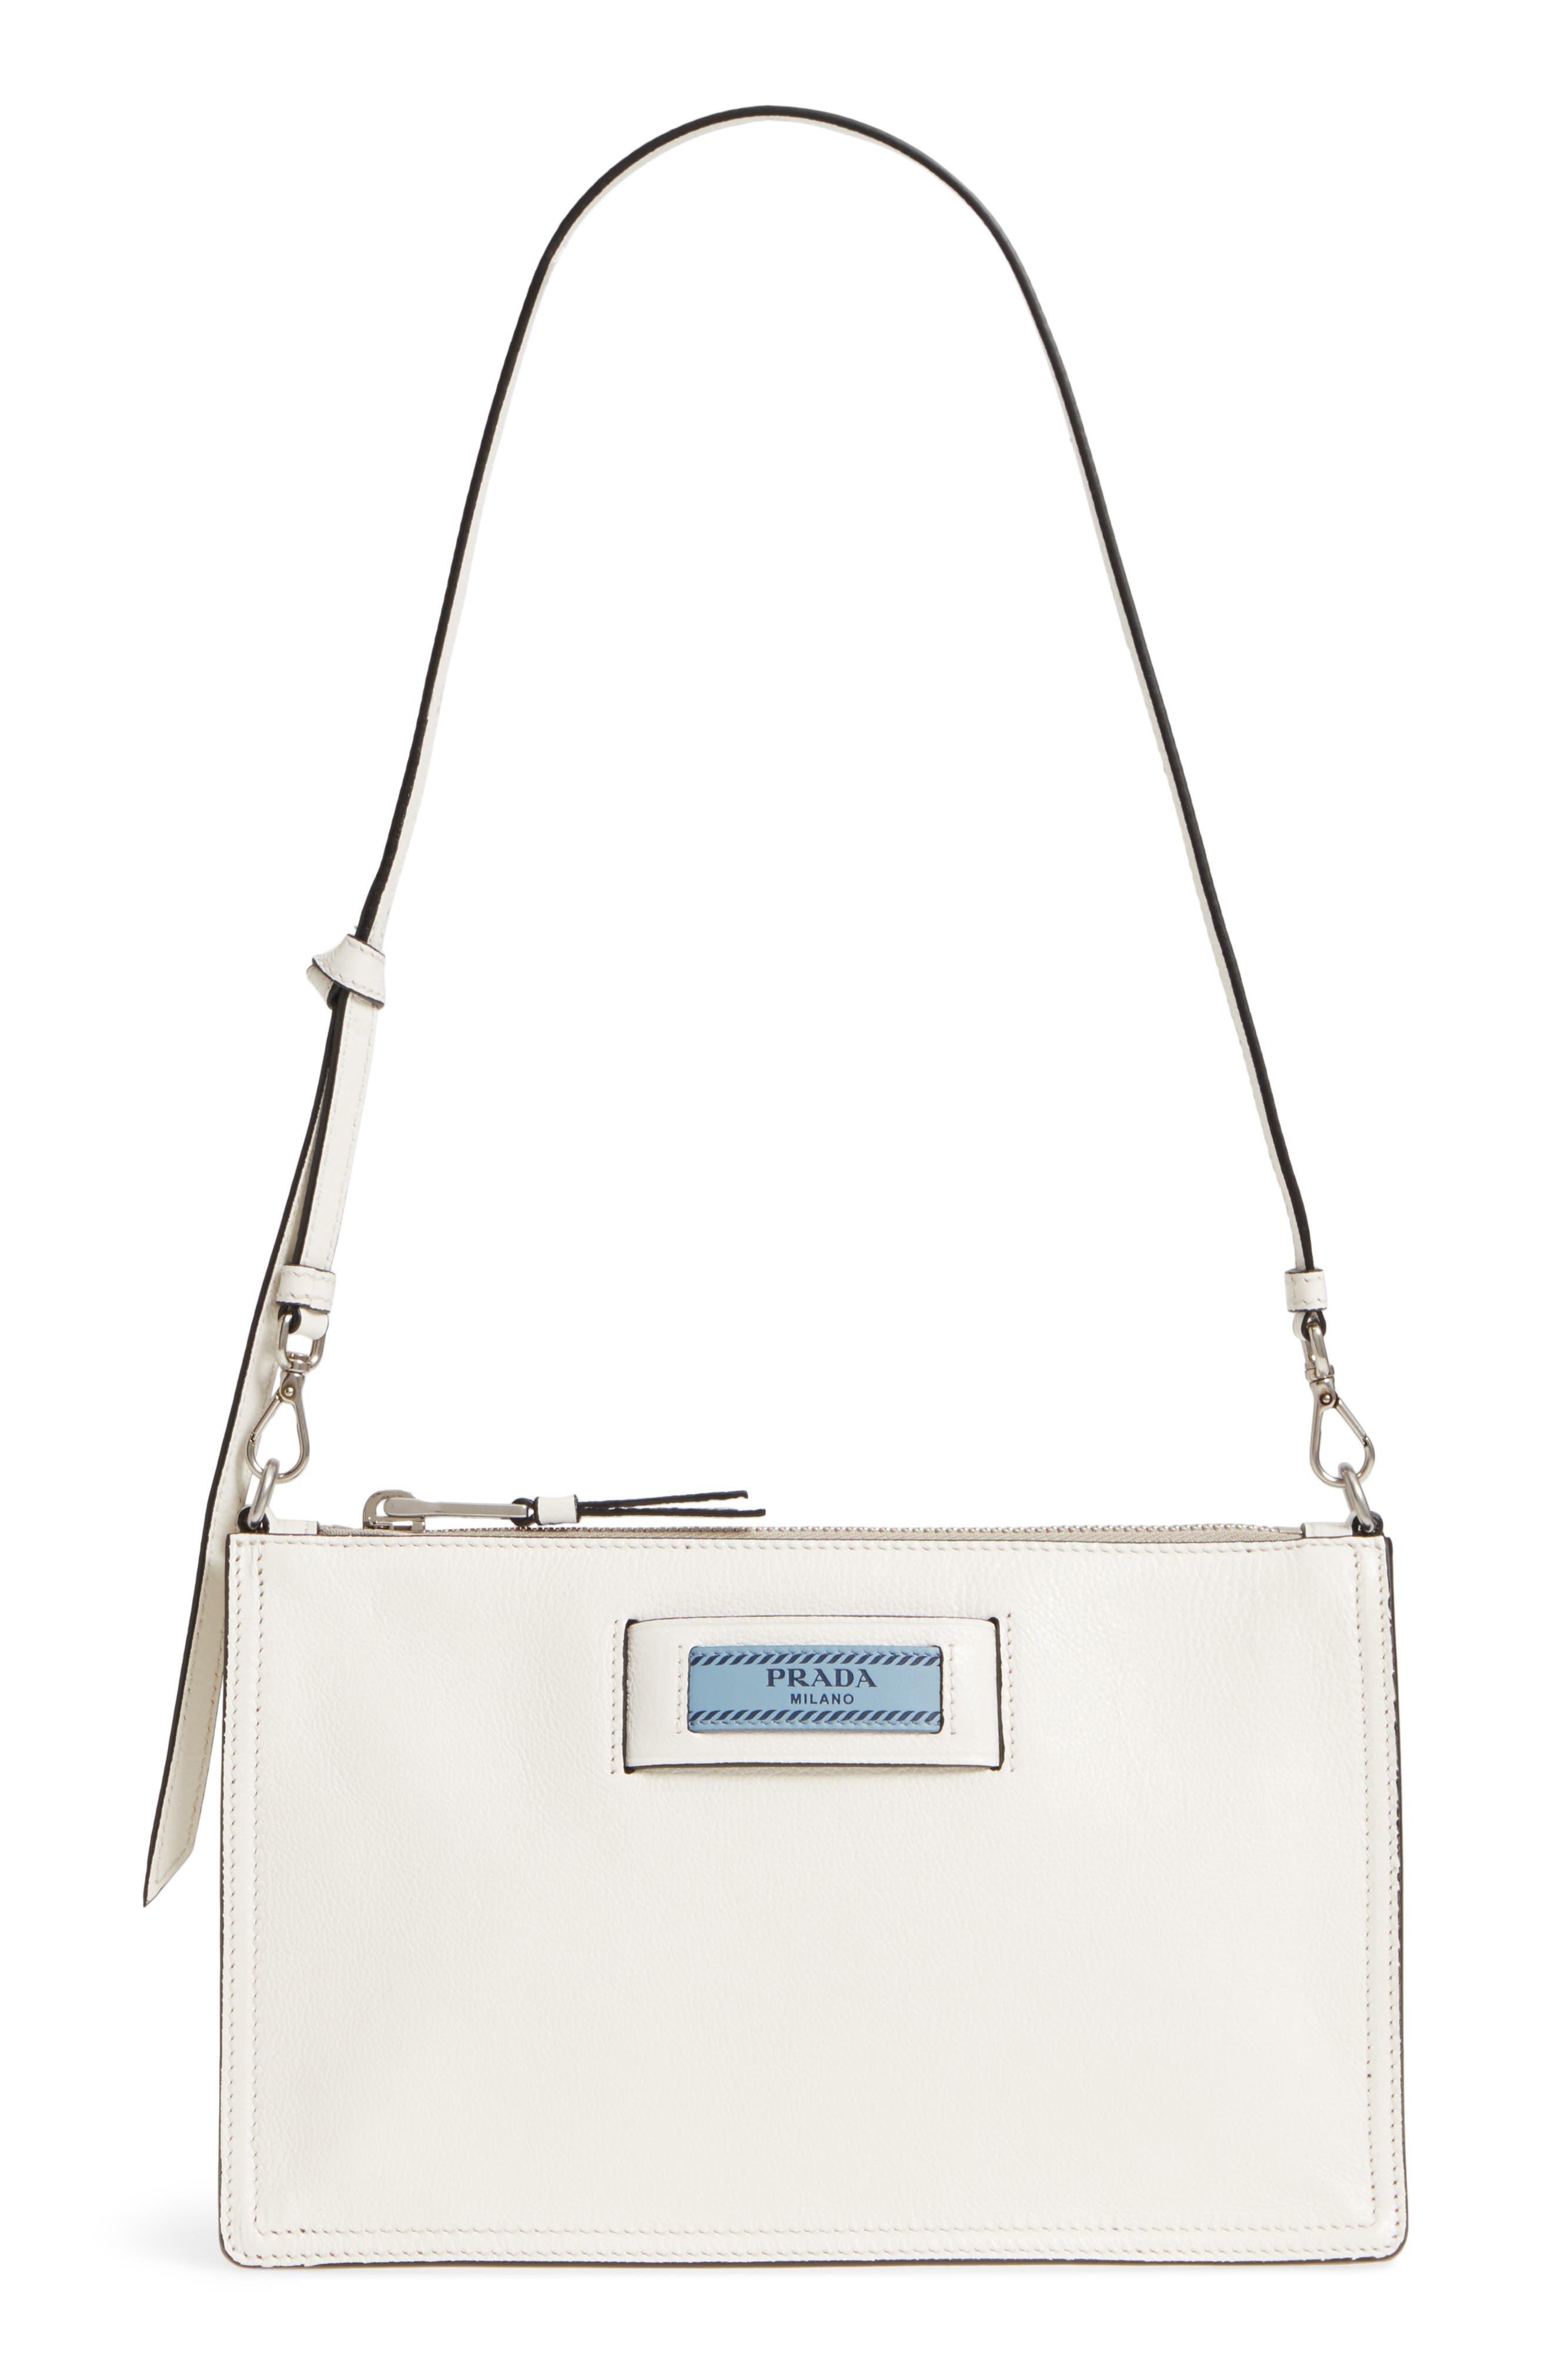 Prada Etiquette Calfskin Shoulder Bag